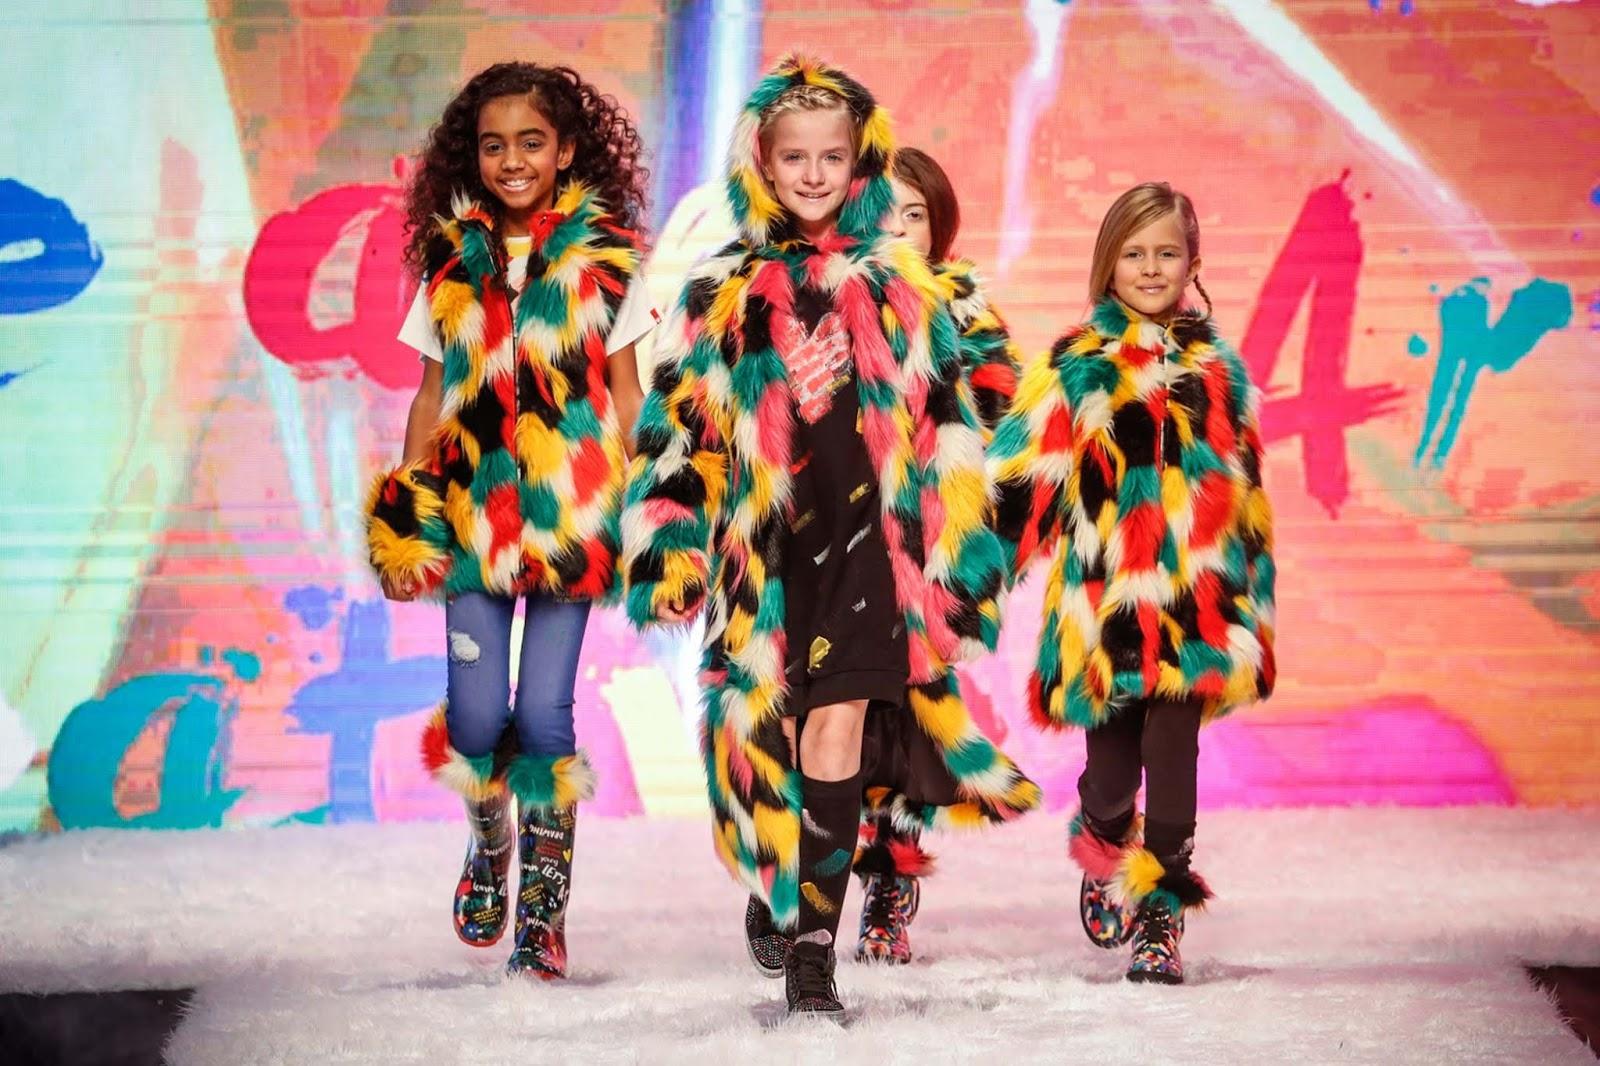 Eniwhere Fashion - Pitti Bimbo 88 - Tuc Tuc